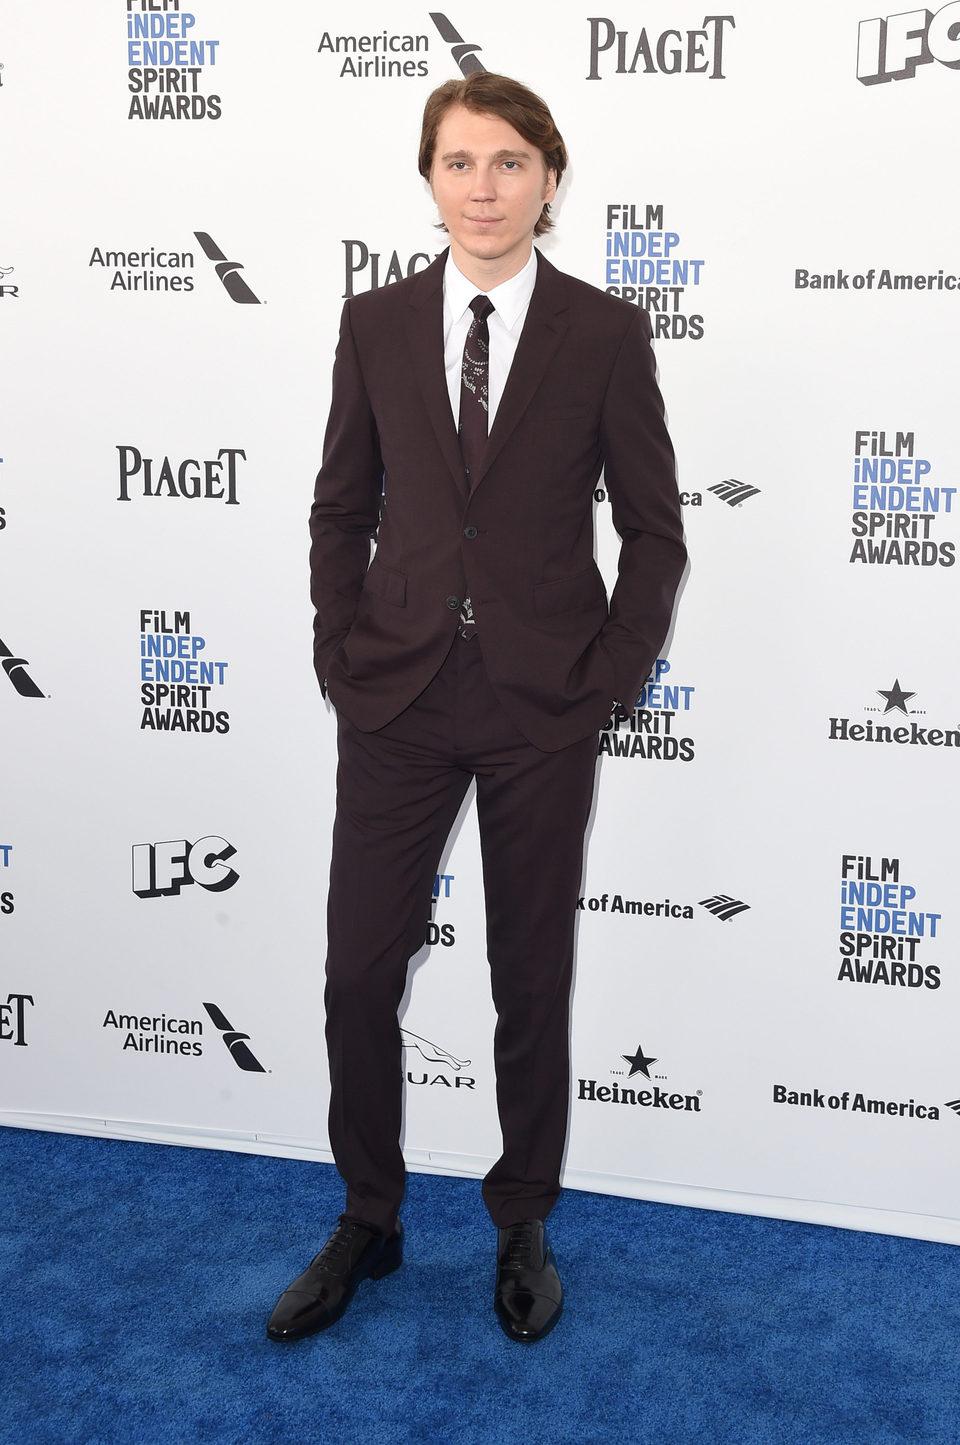 Paul Dano en la alfombra roja de los Independent Spirit Awards 2016